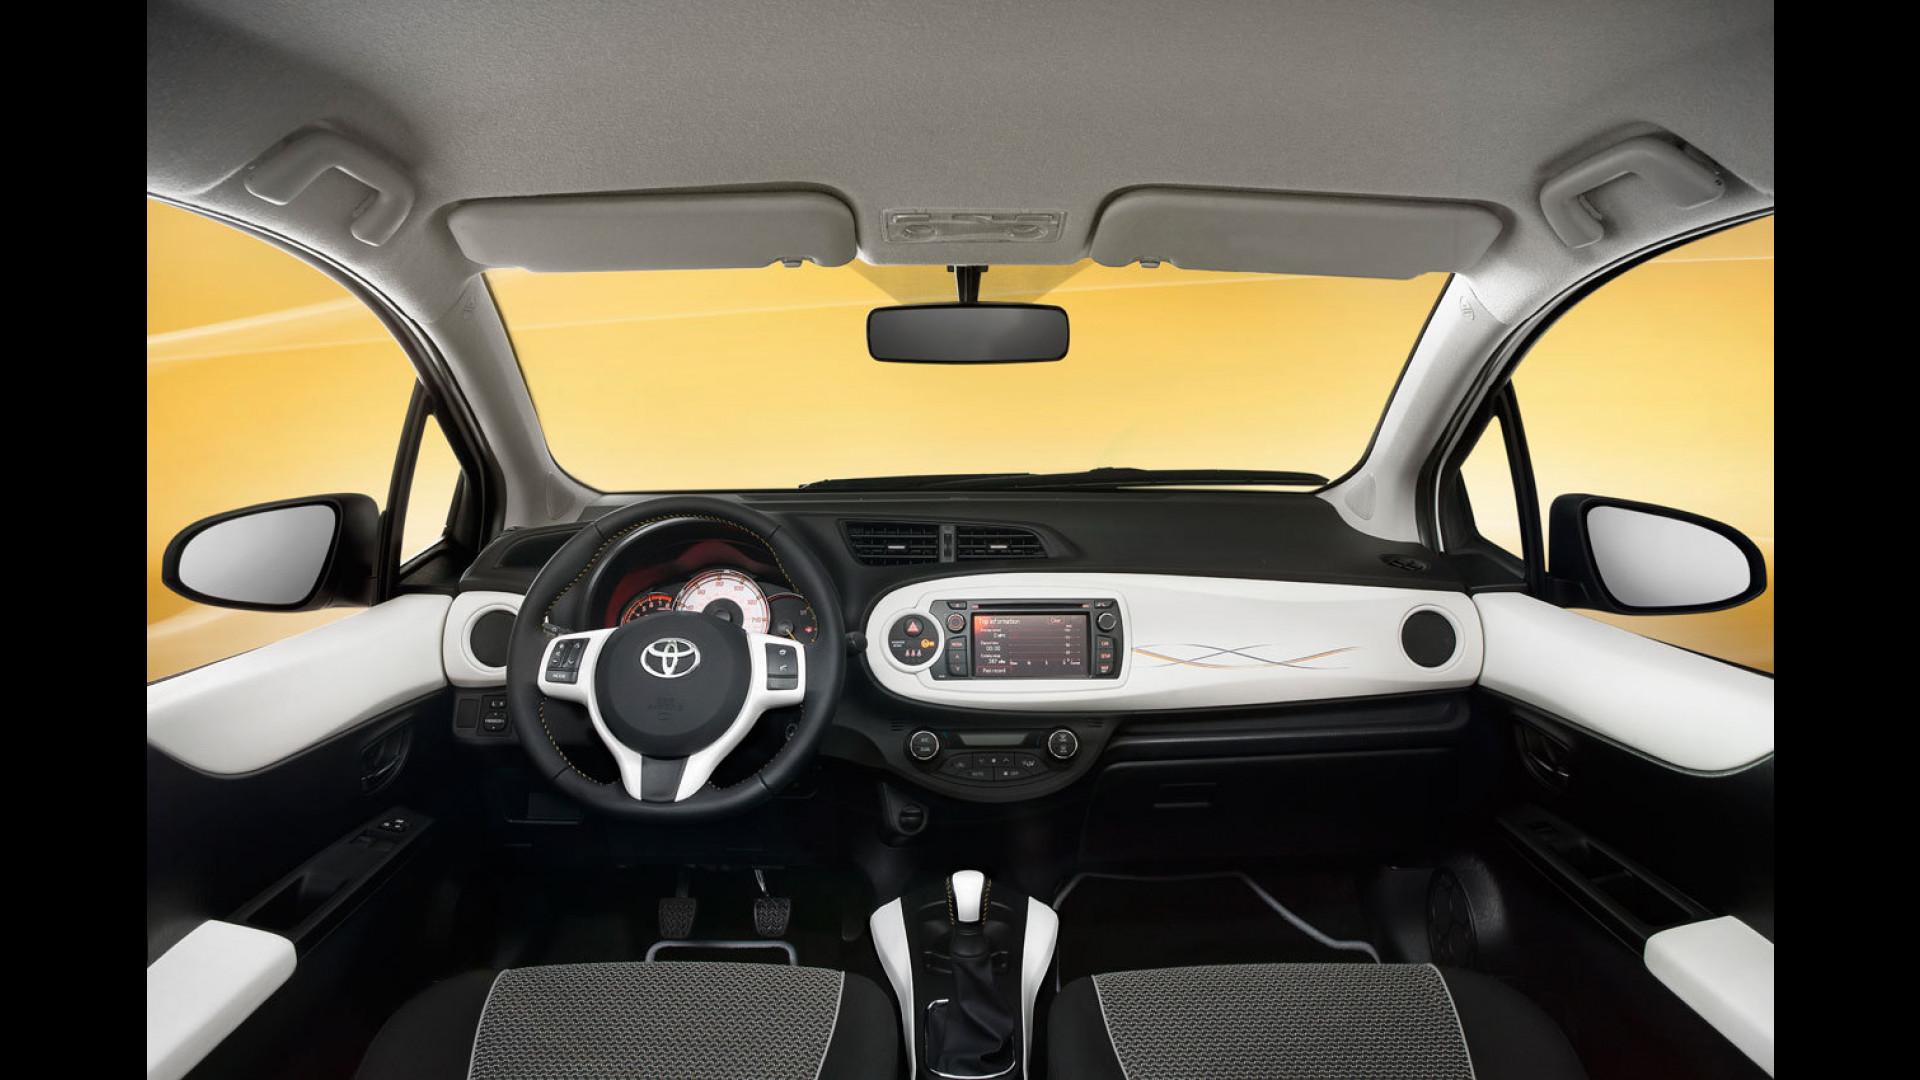 Schema Elettrico Yaris : Toyota yaris trend motor1.com italia